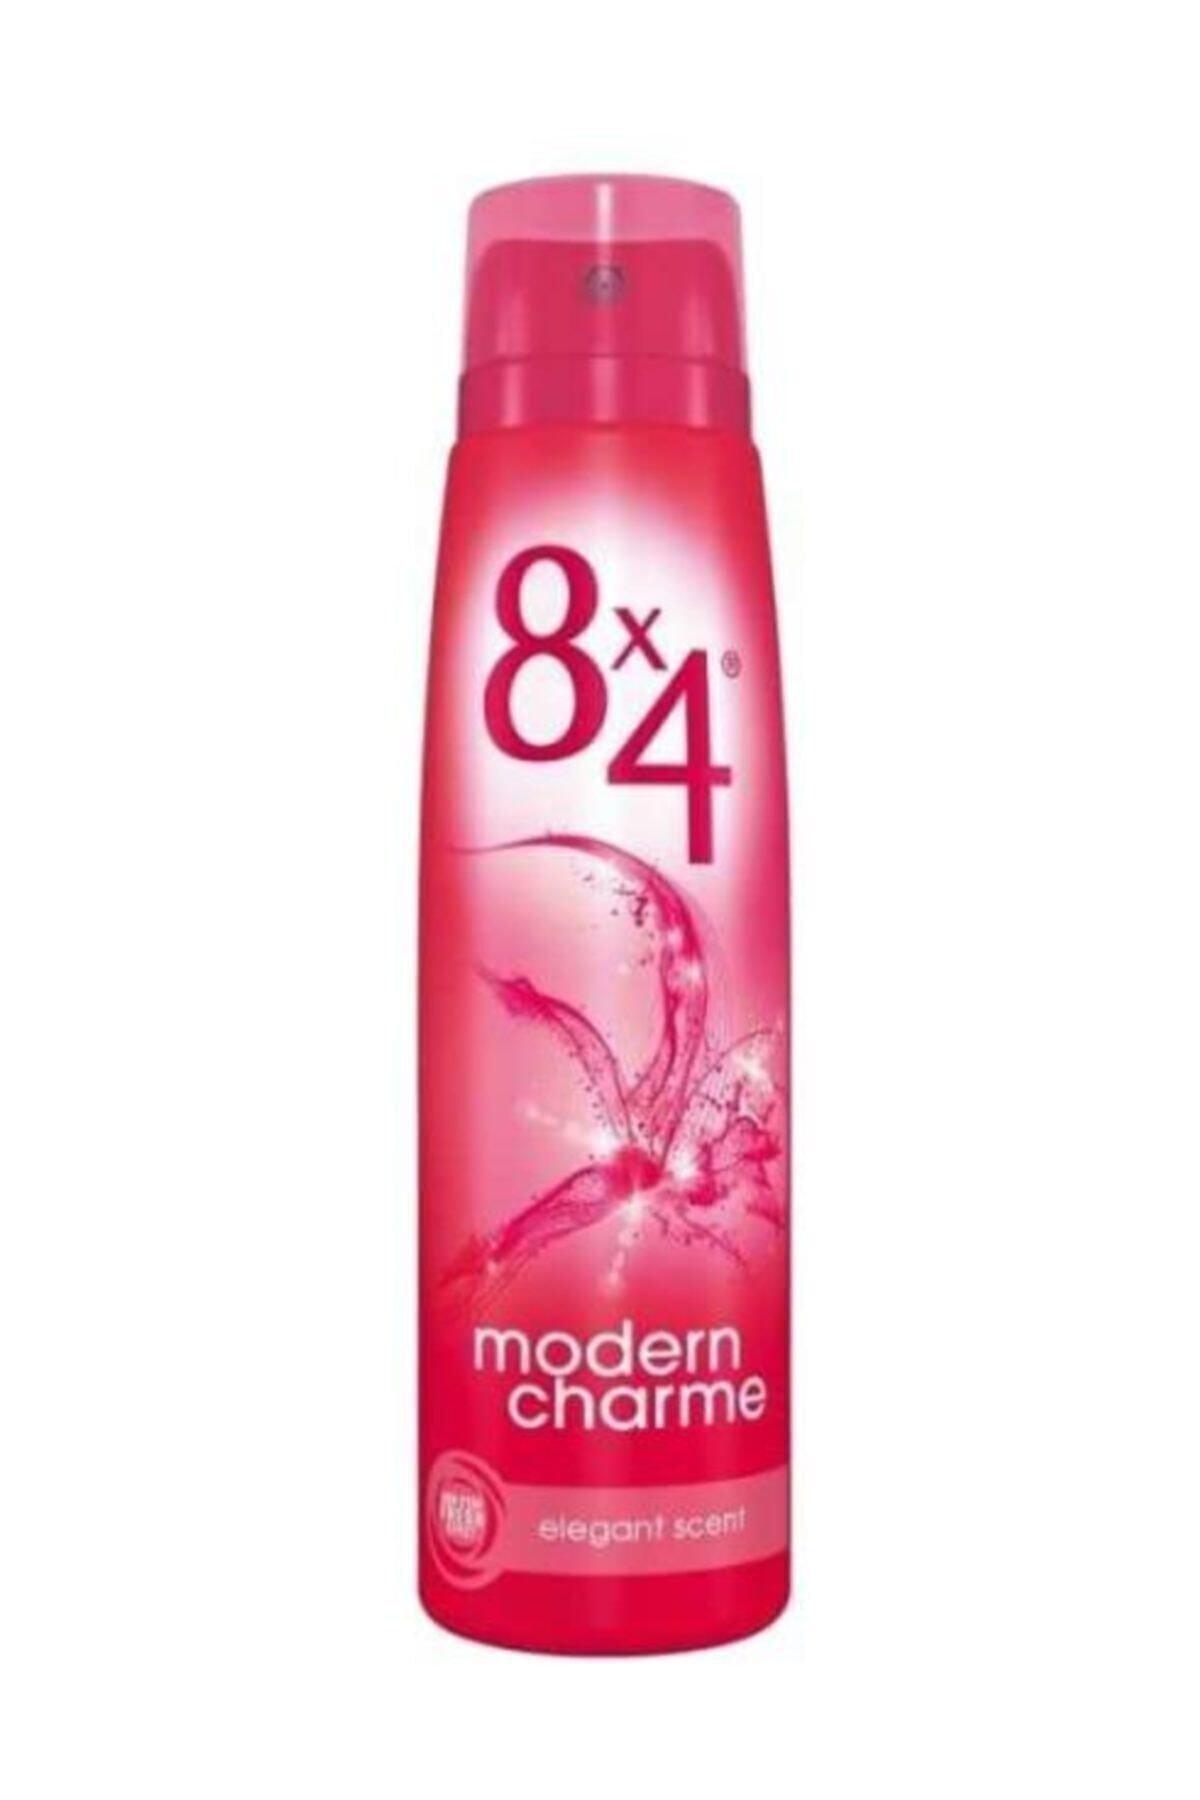 8x4 Modern Charme Sprey Deodorant 150 ml 1